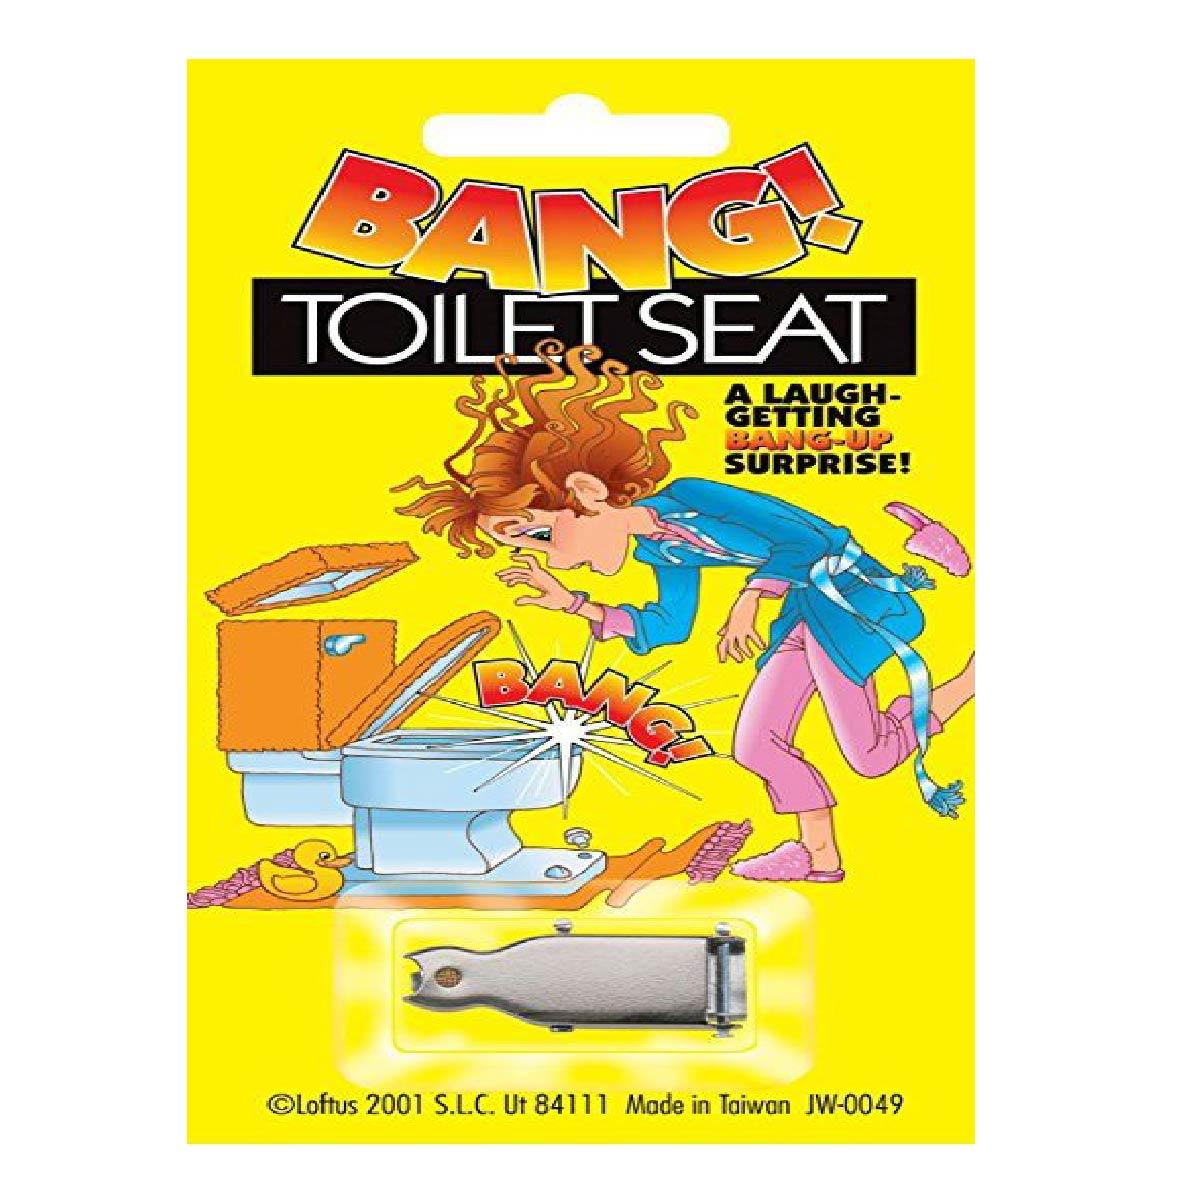 Privada Explosiva - Bang Toilet Seat. R+